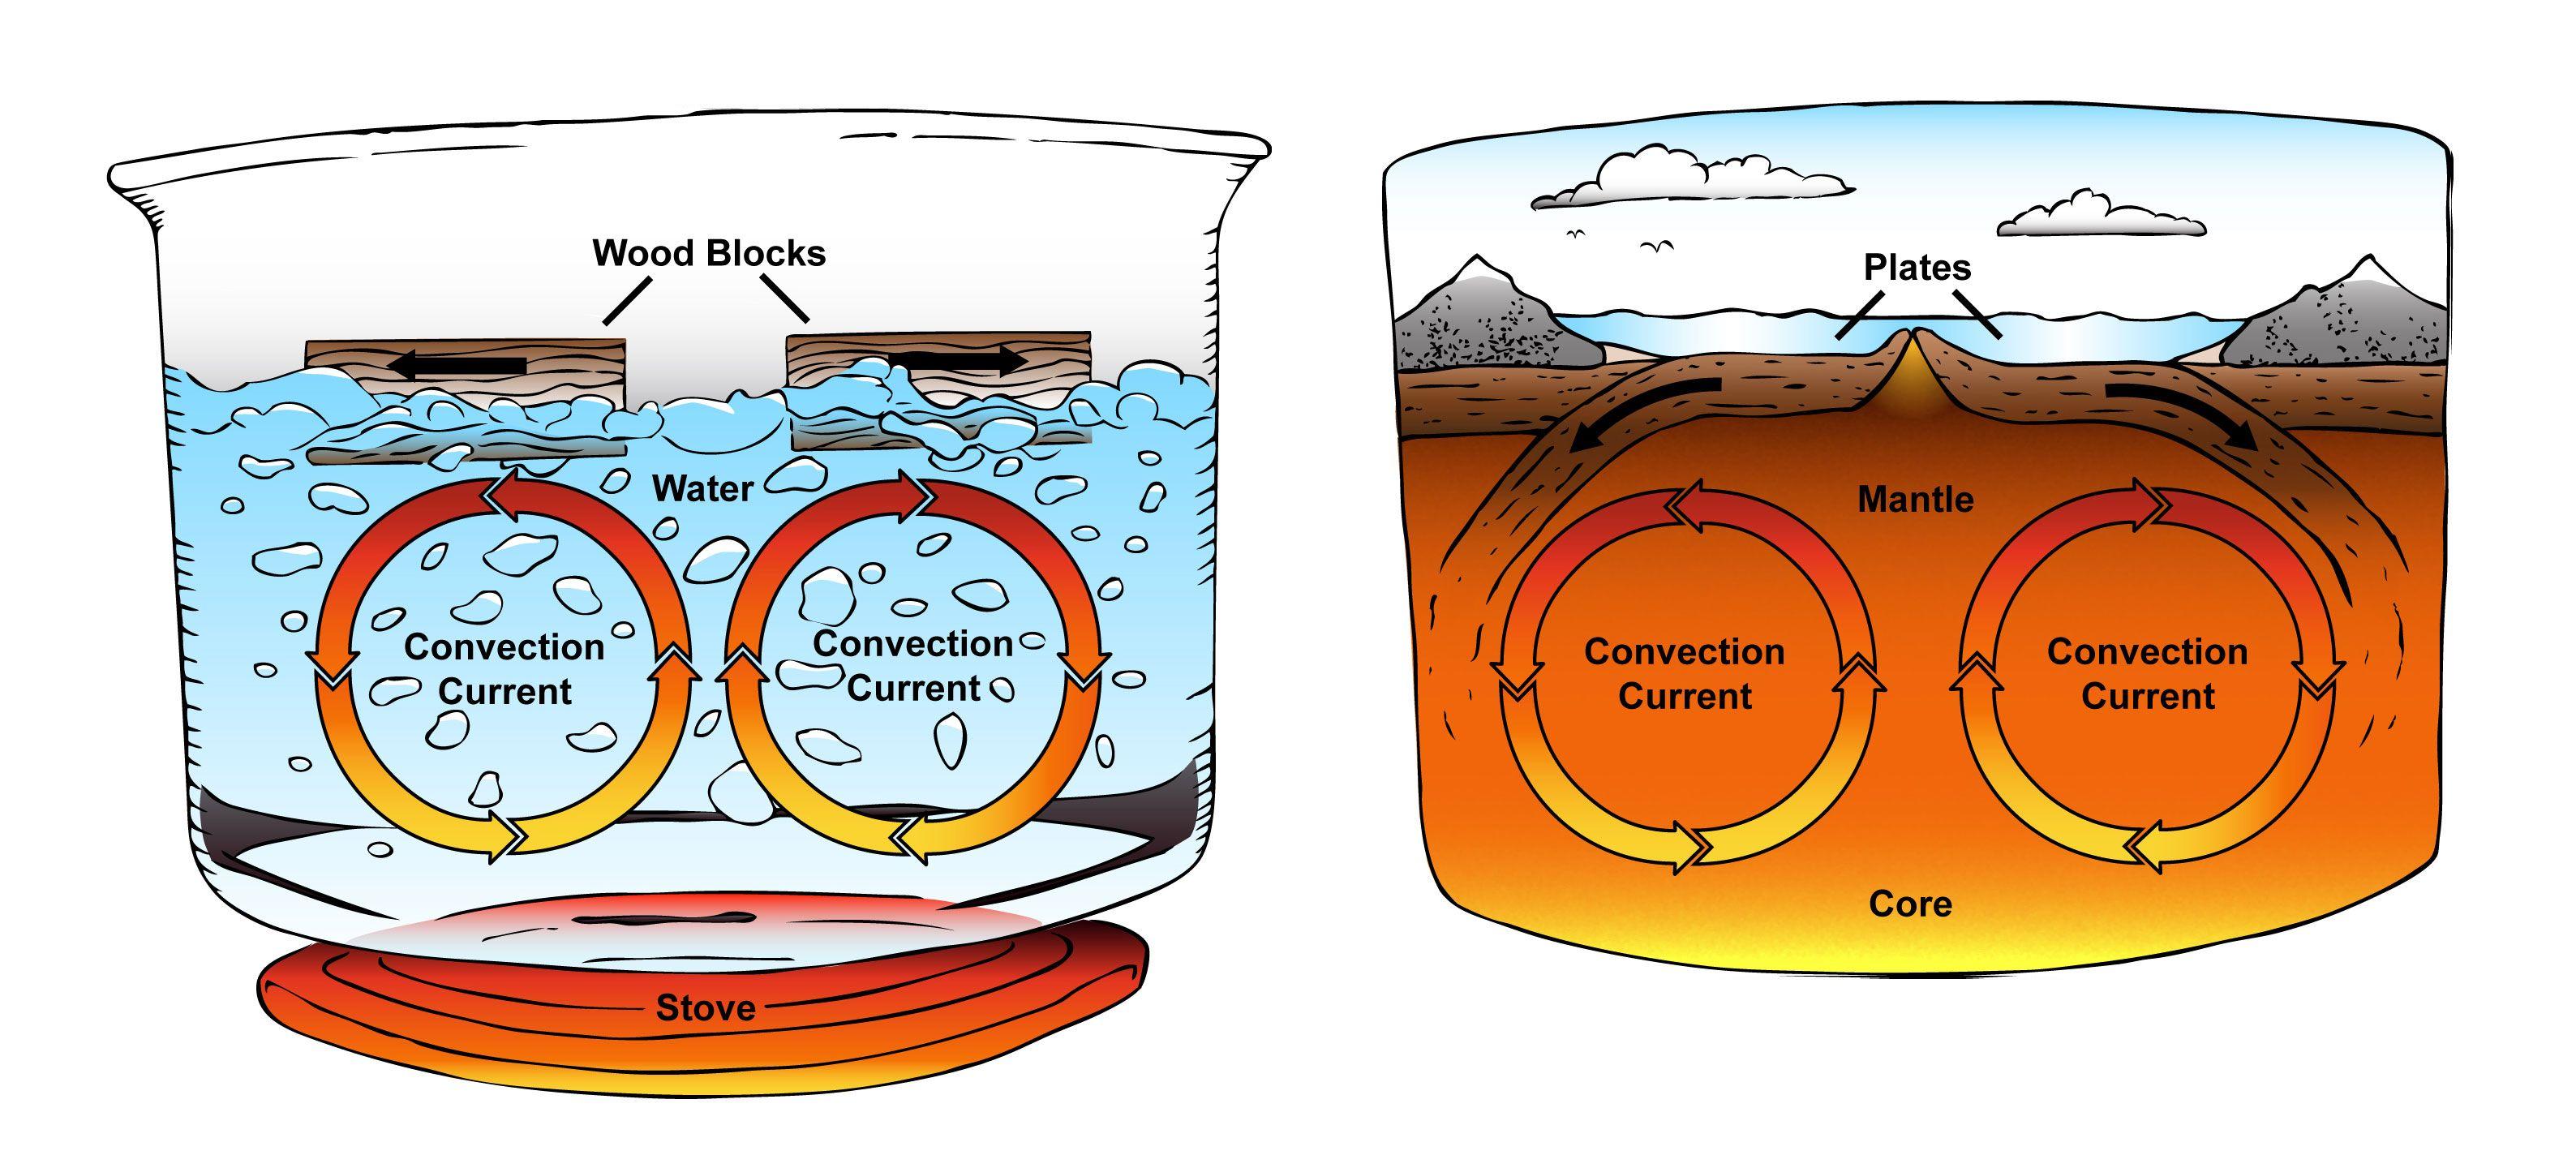 Plate Tectonic Metaphor Illustrations Cmu Convection Currents Plate Tectonics Plate Tectonics Lesson